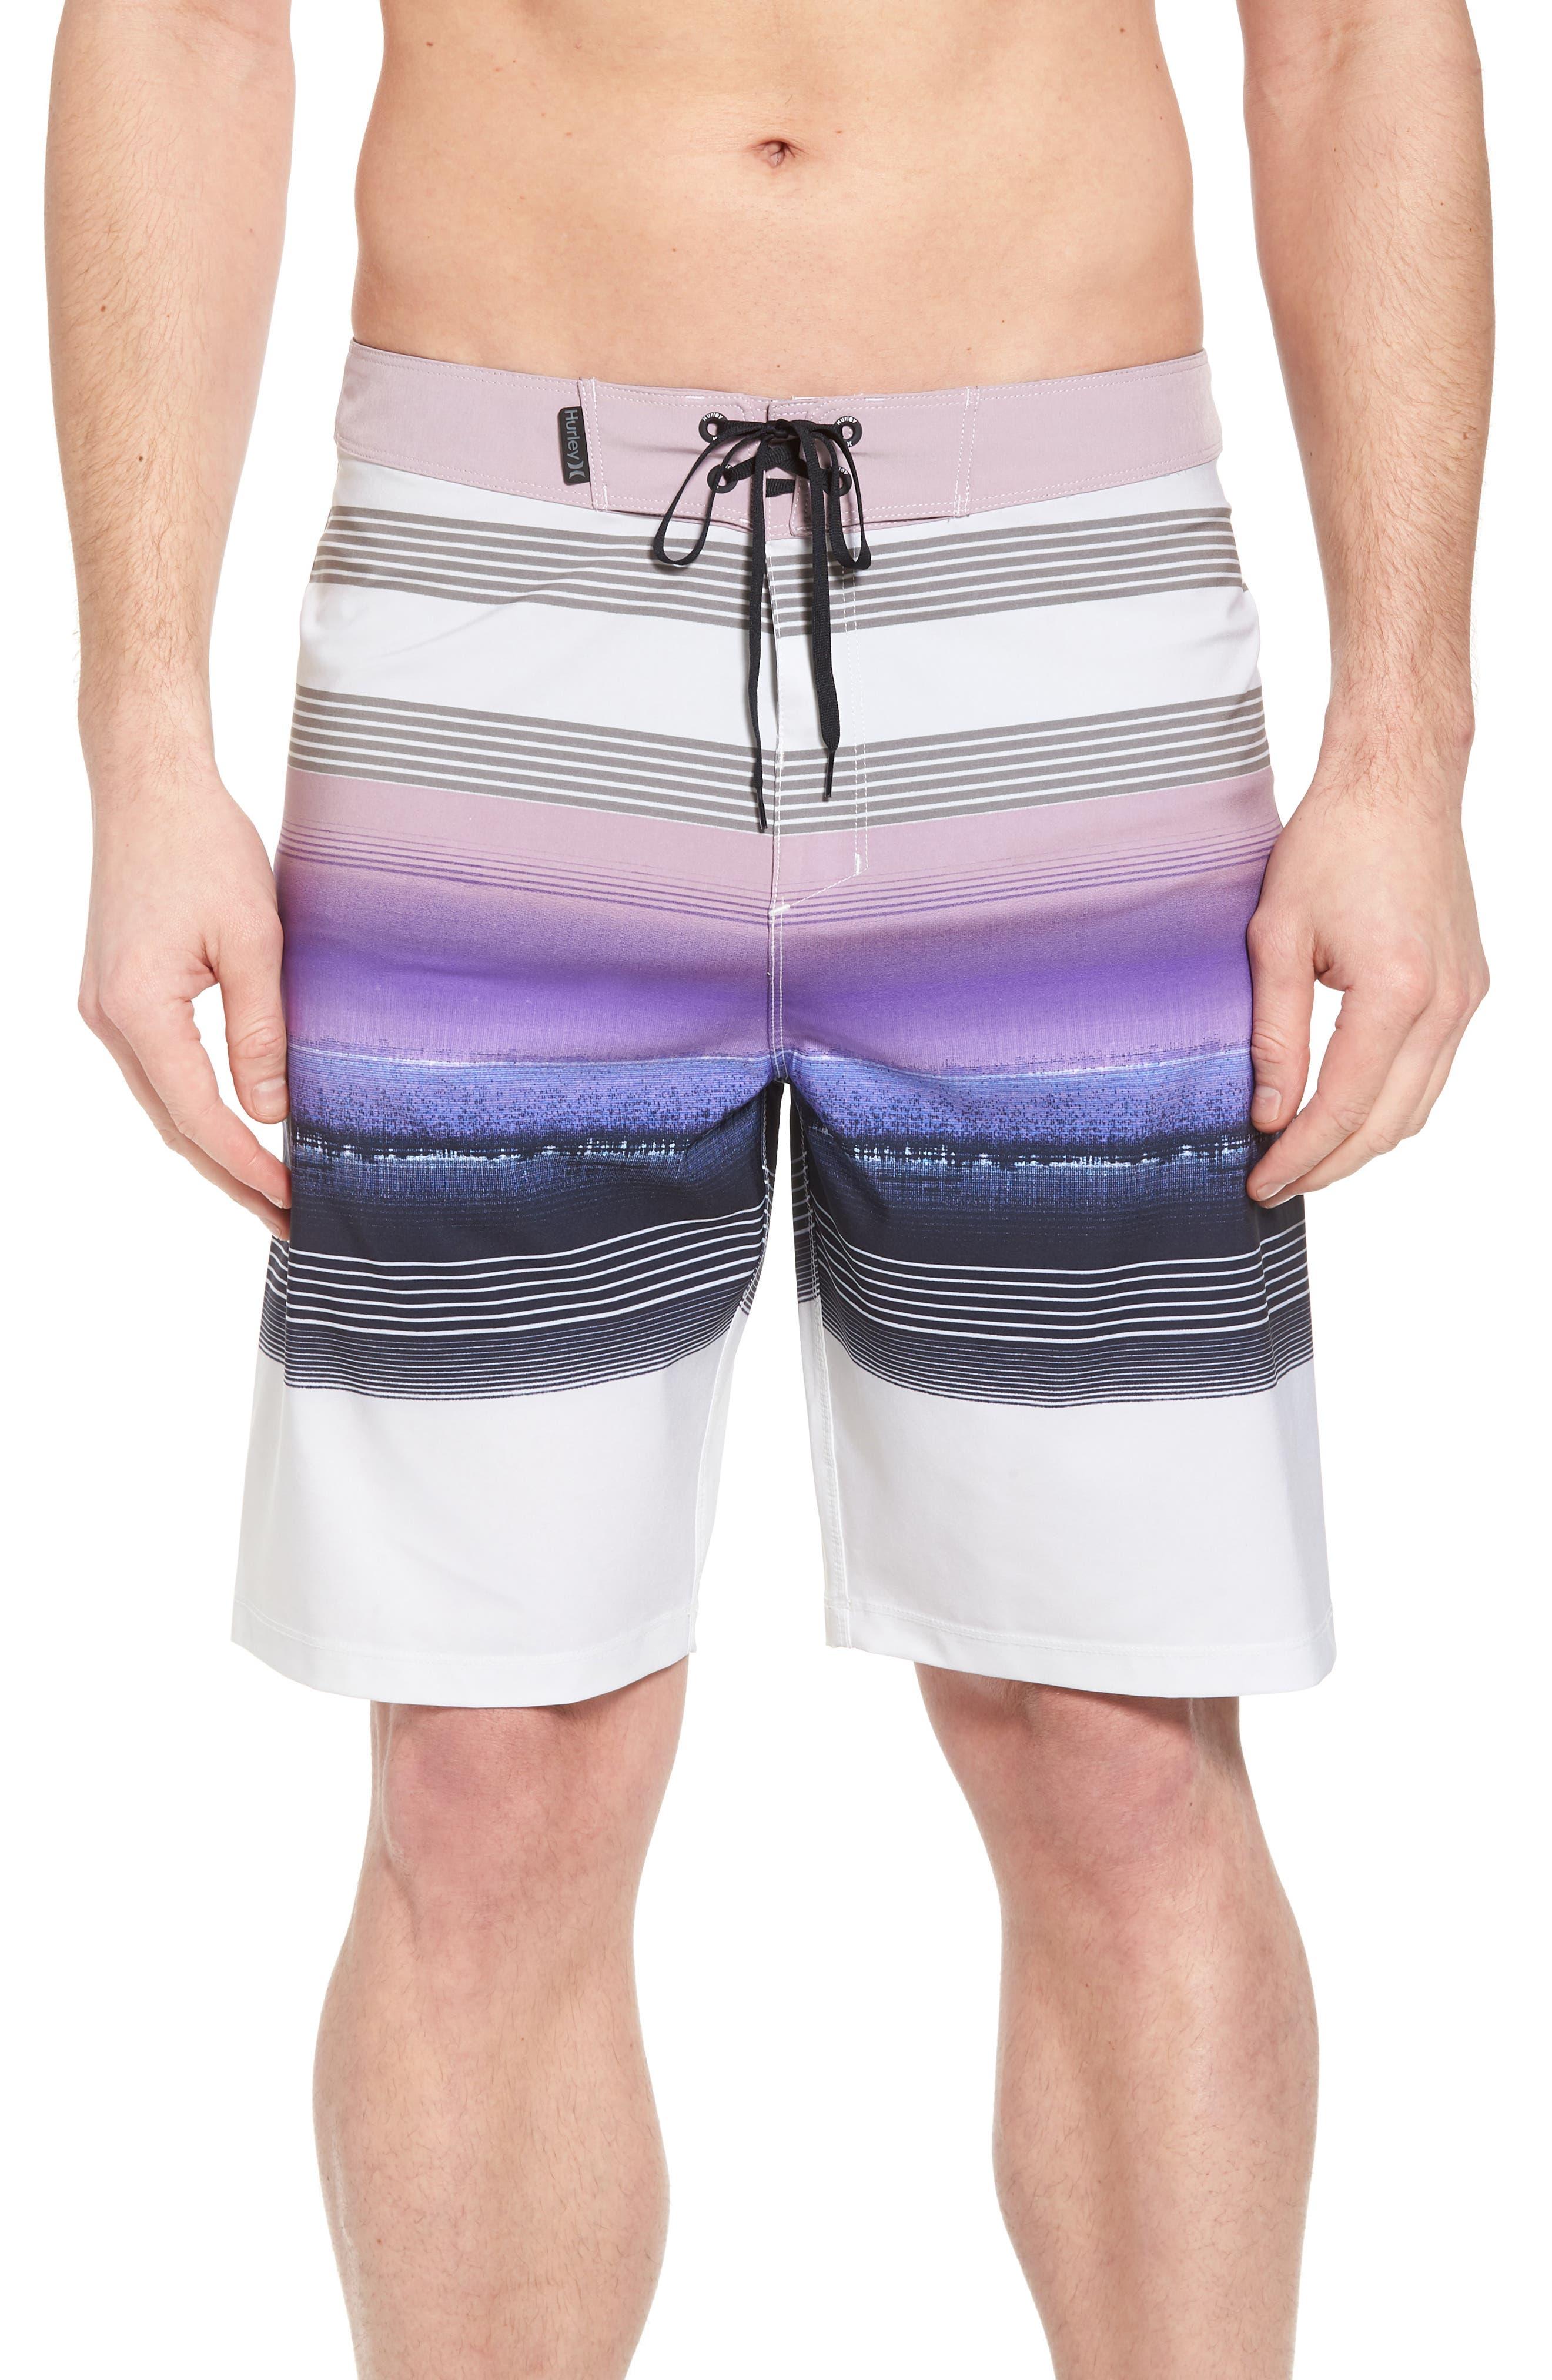 Phantom Gaviota Board Shorts,                             Main thumbnail 1, color,                             Light Bone